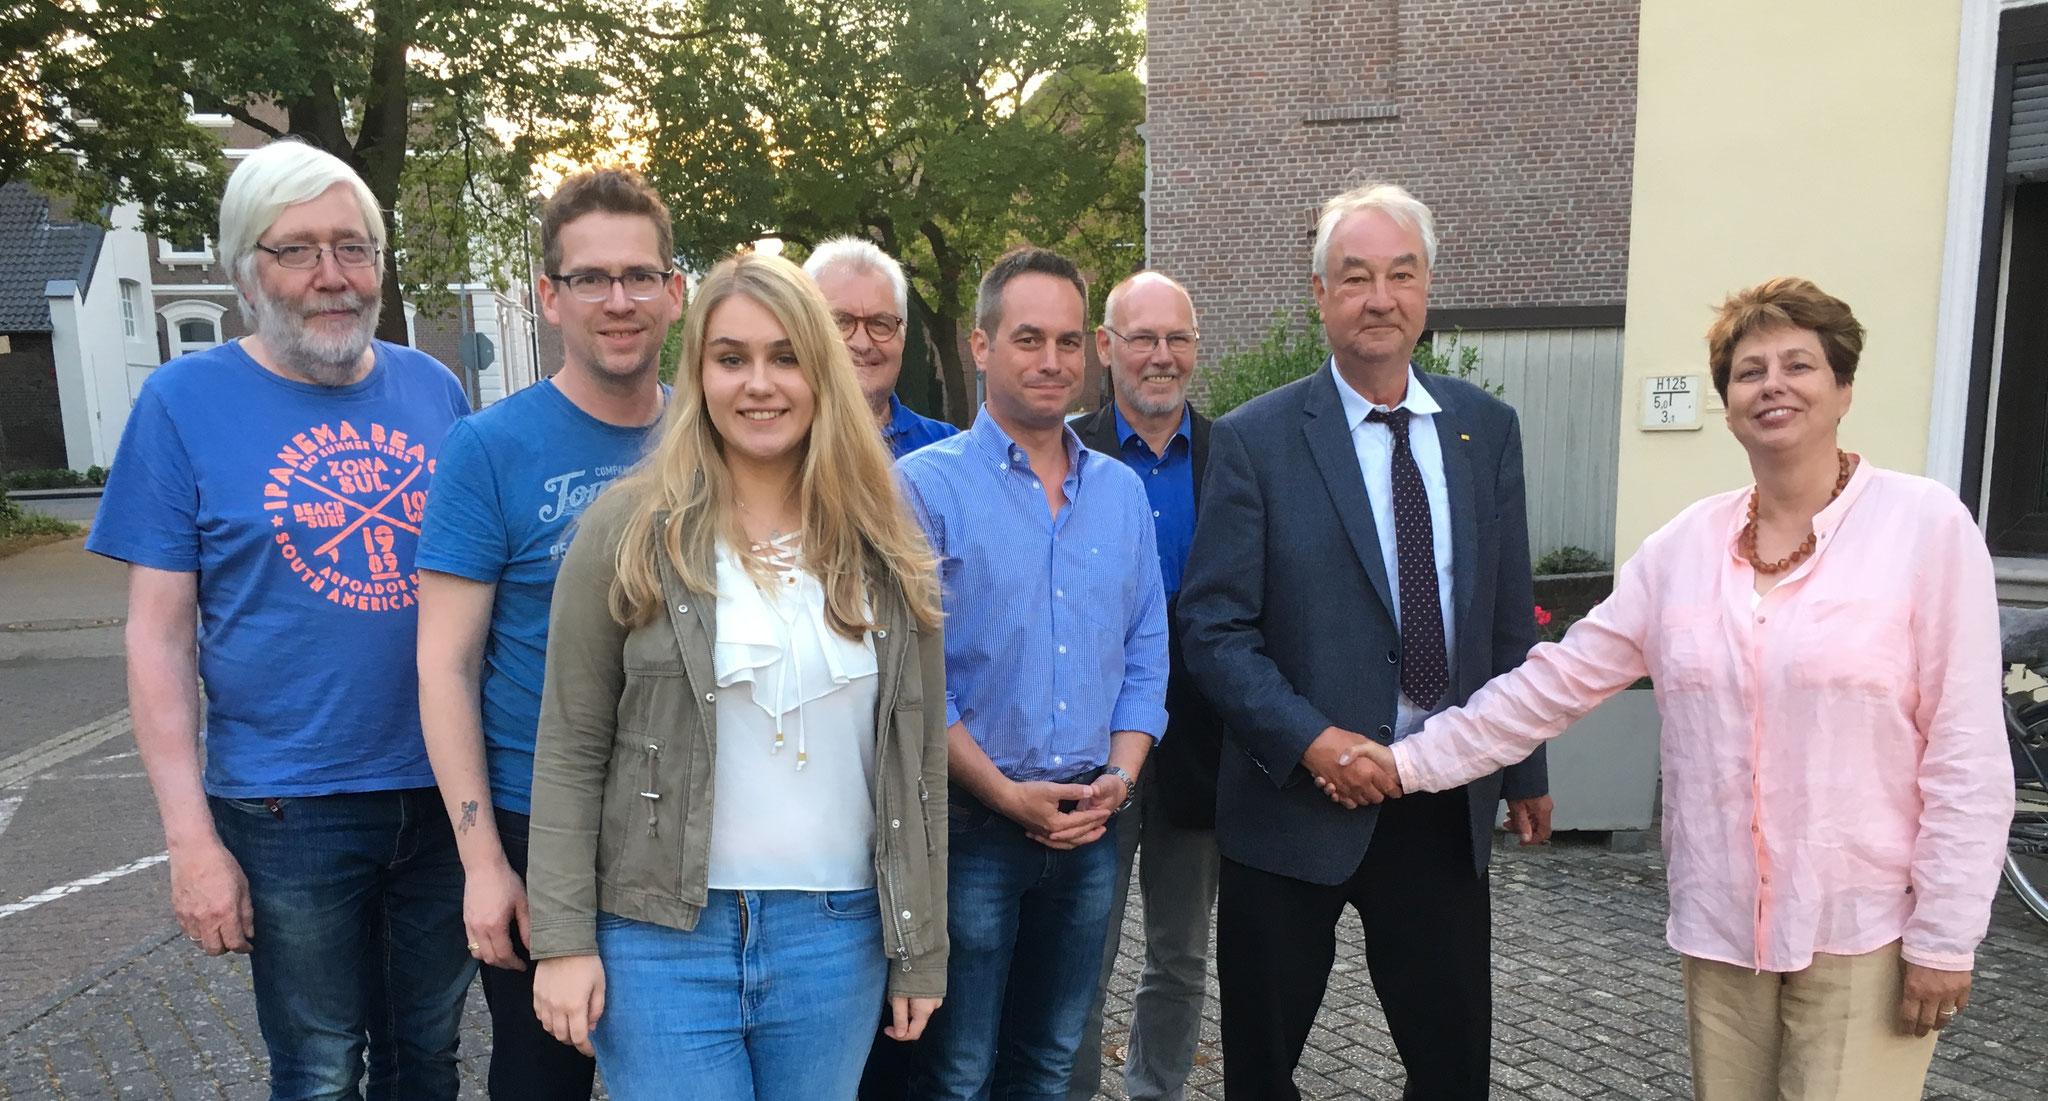 Ortsparteitag der FDP Schwalmtal am 23. Mai 2018 in Waldniel